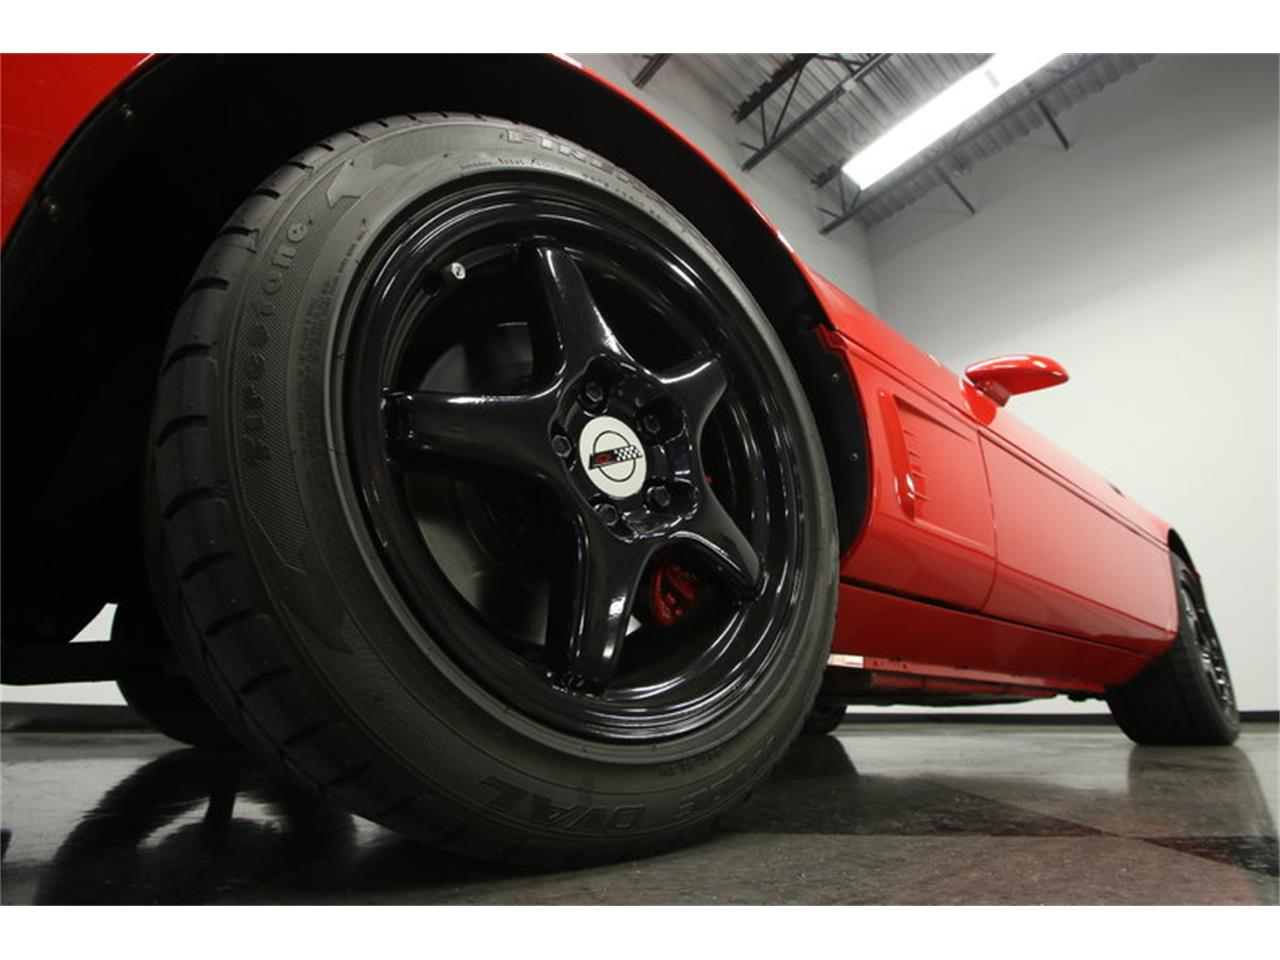 Large Picture of '95 Chevrolet Corvette located in Lutz Florida - $15,995.00 - IURO